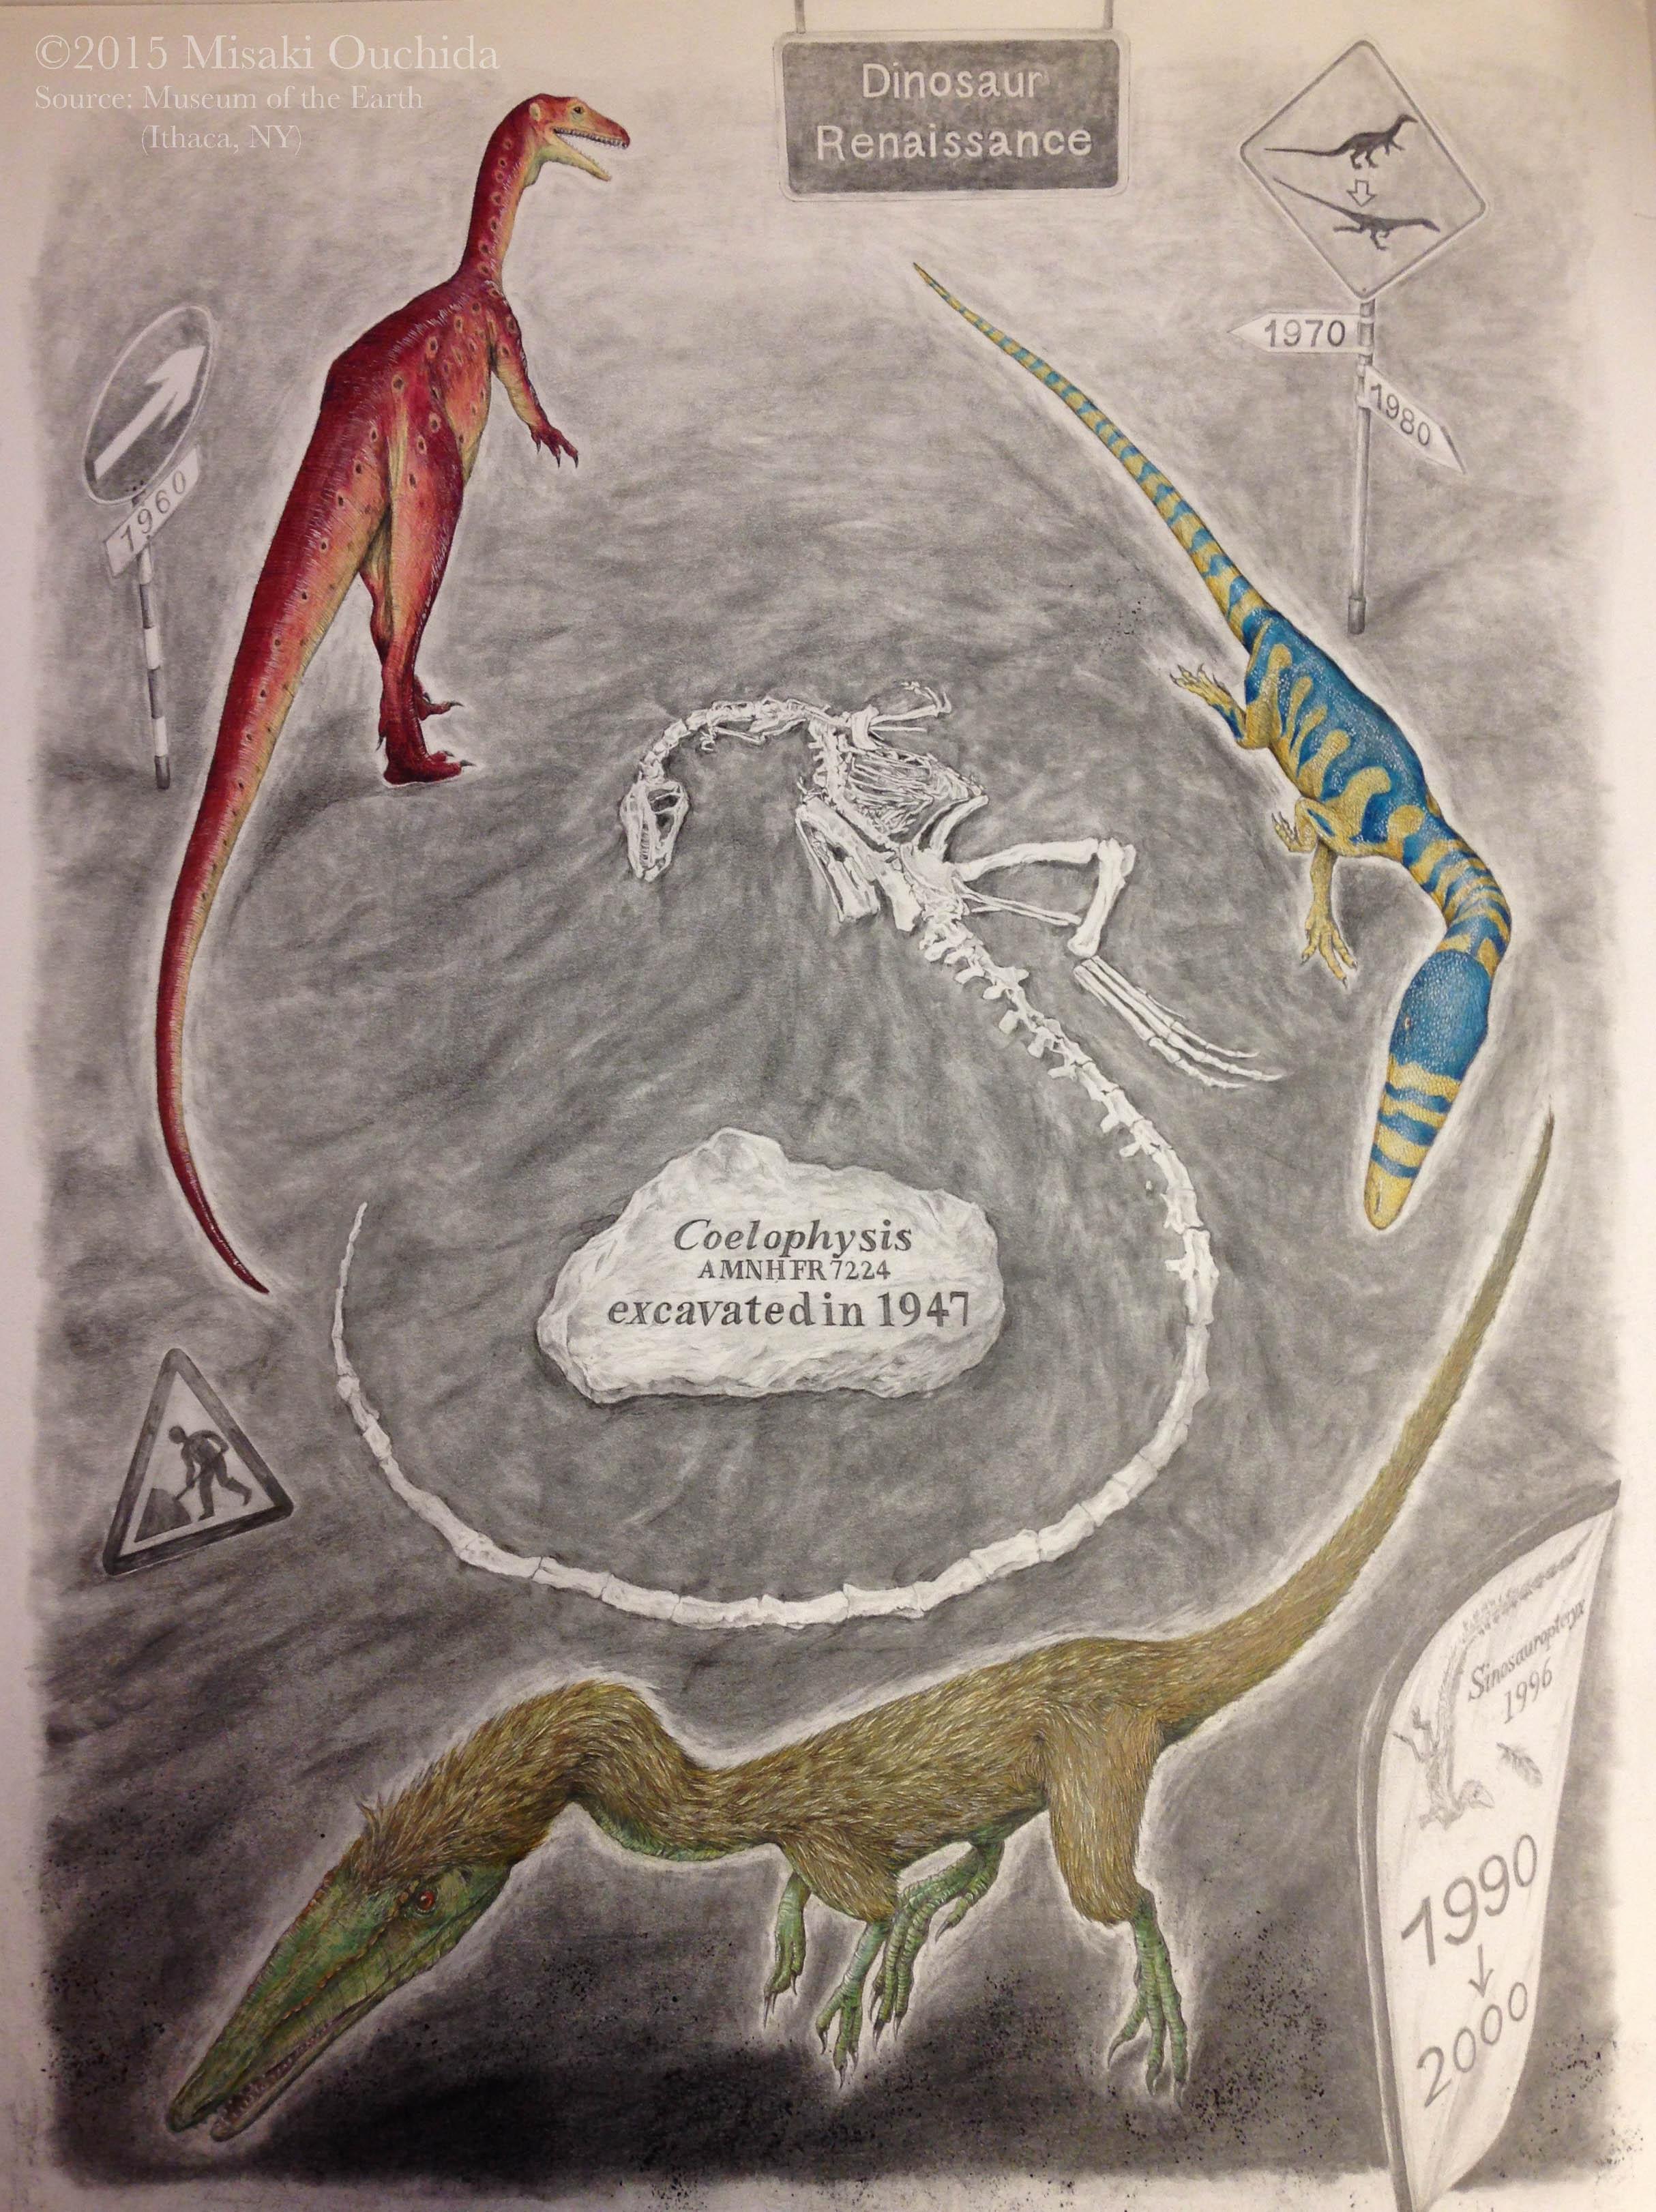 Coelophysis